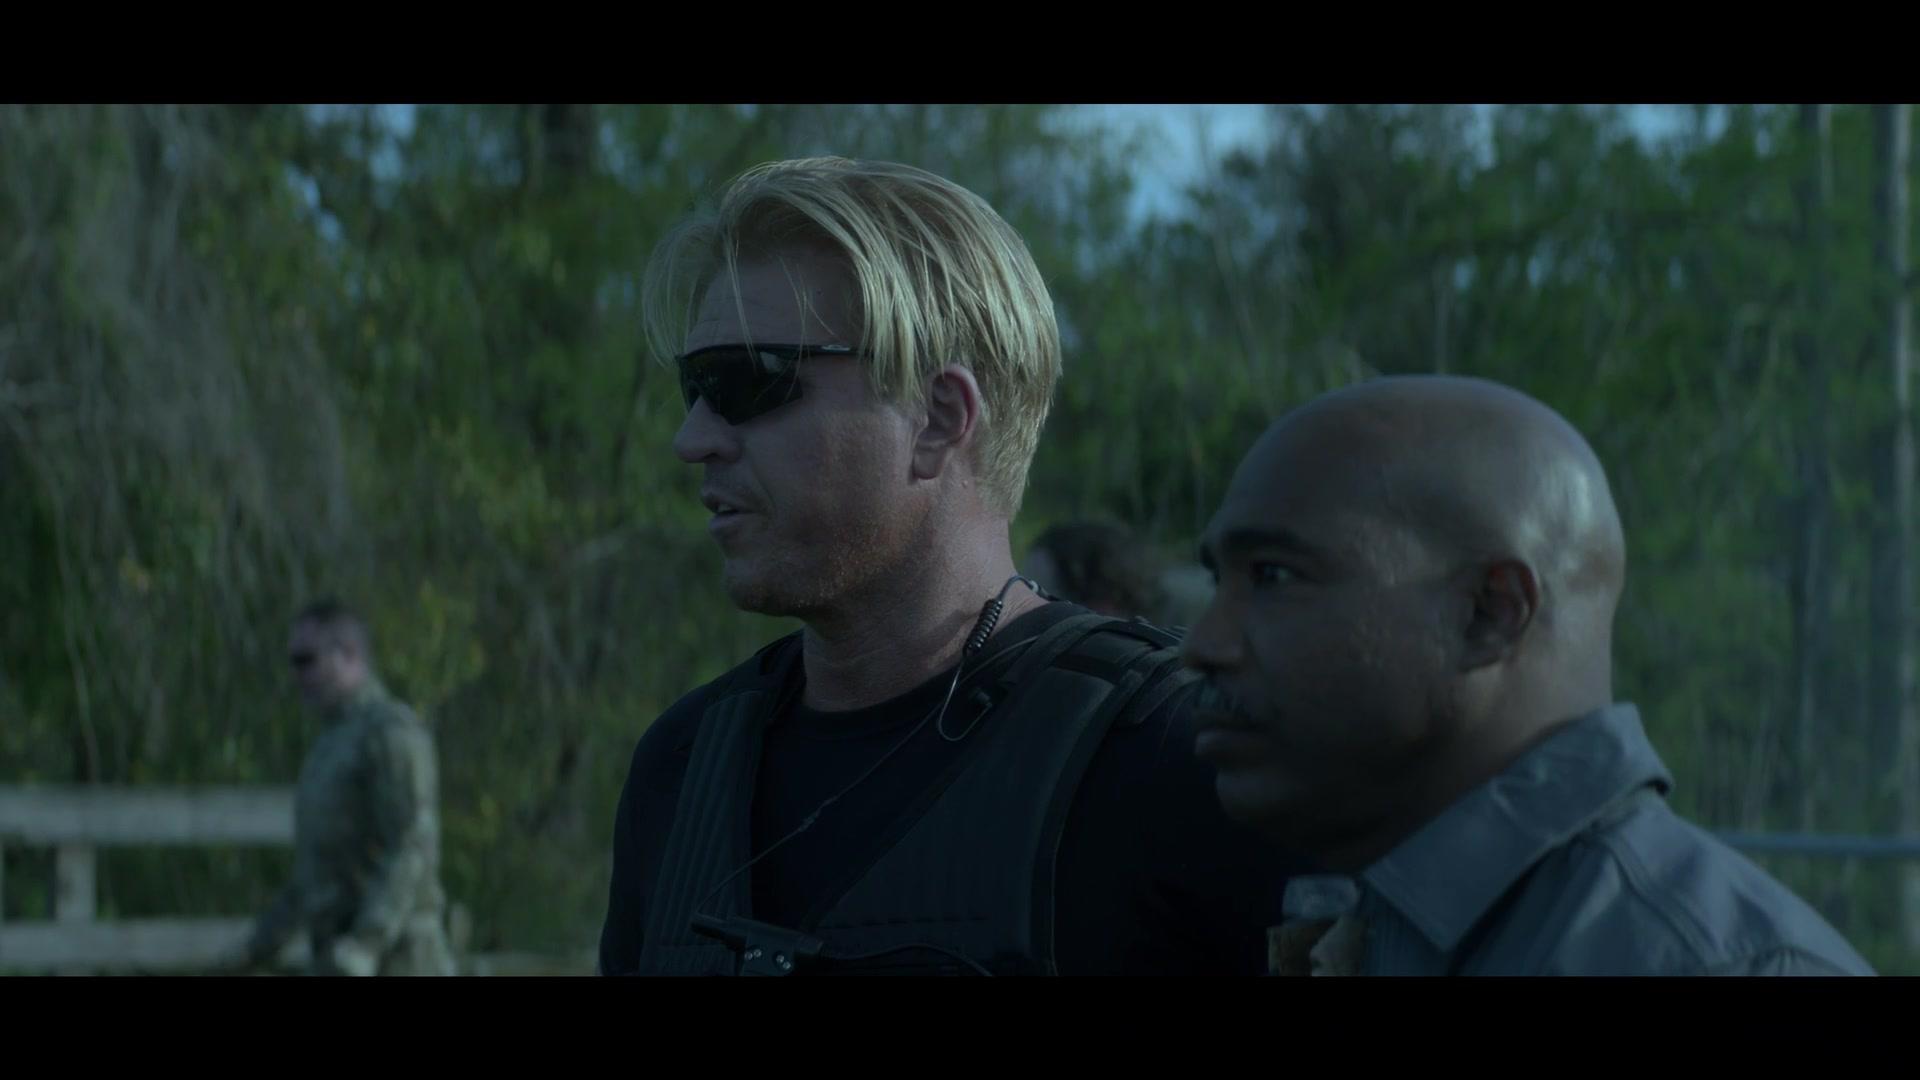 Oakley Sunglasses in Swamp Thing – Season 1 Episode 10